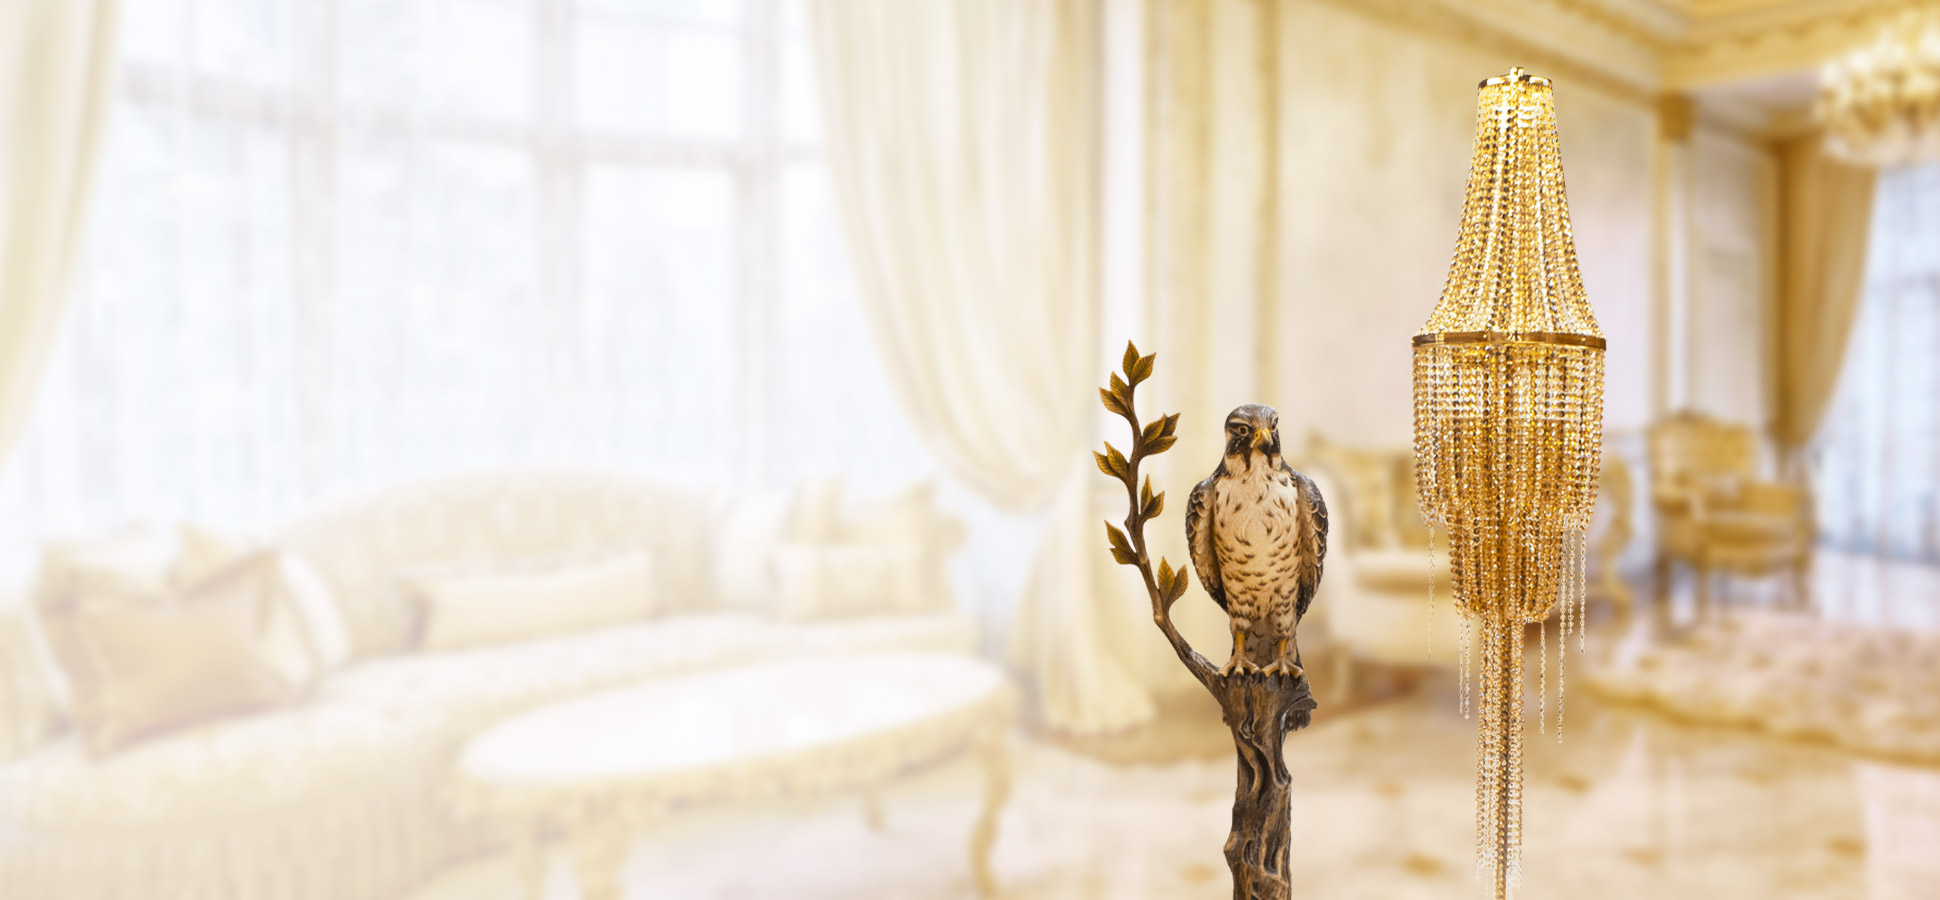 Background image 6 | natalis-luxus.com